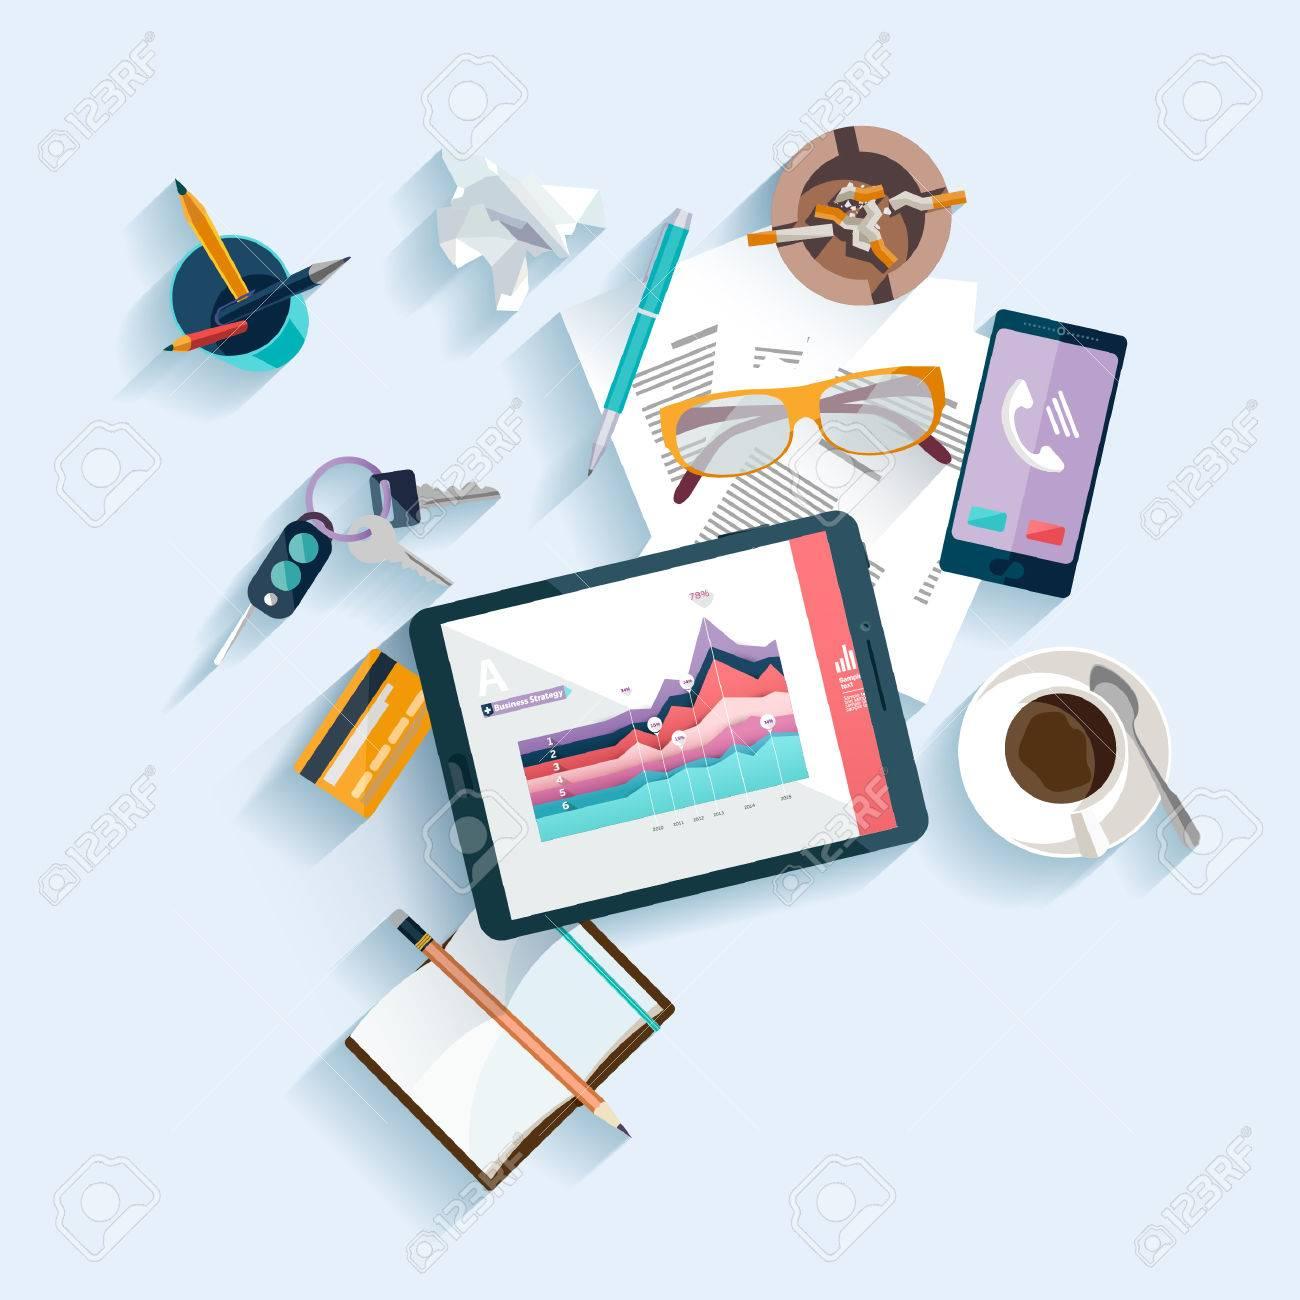 Workplace concept. Flat design. - 37520799